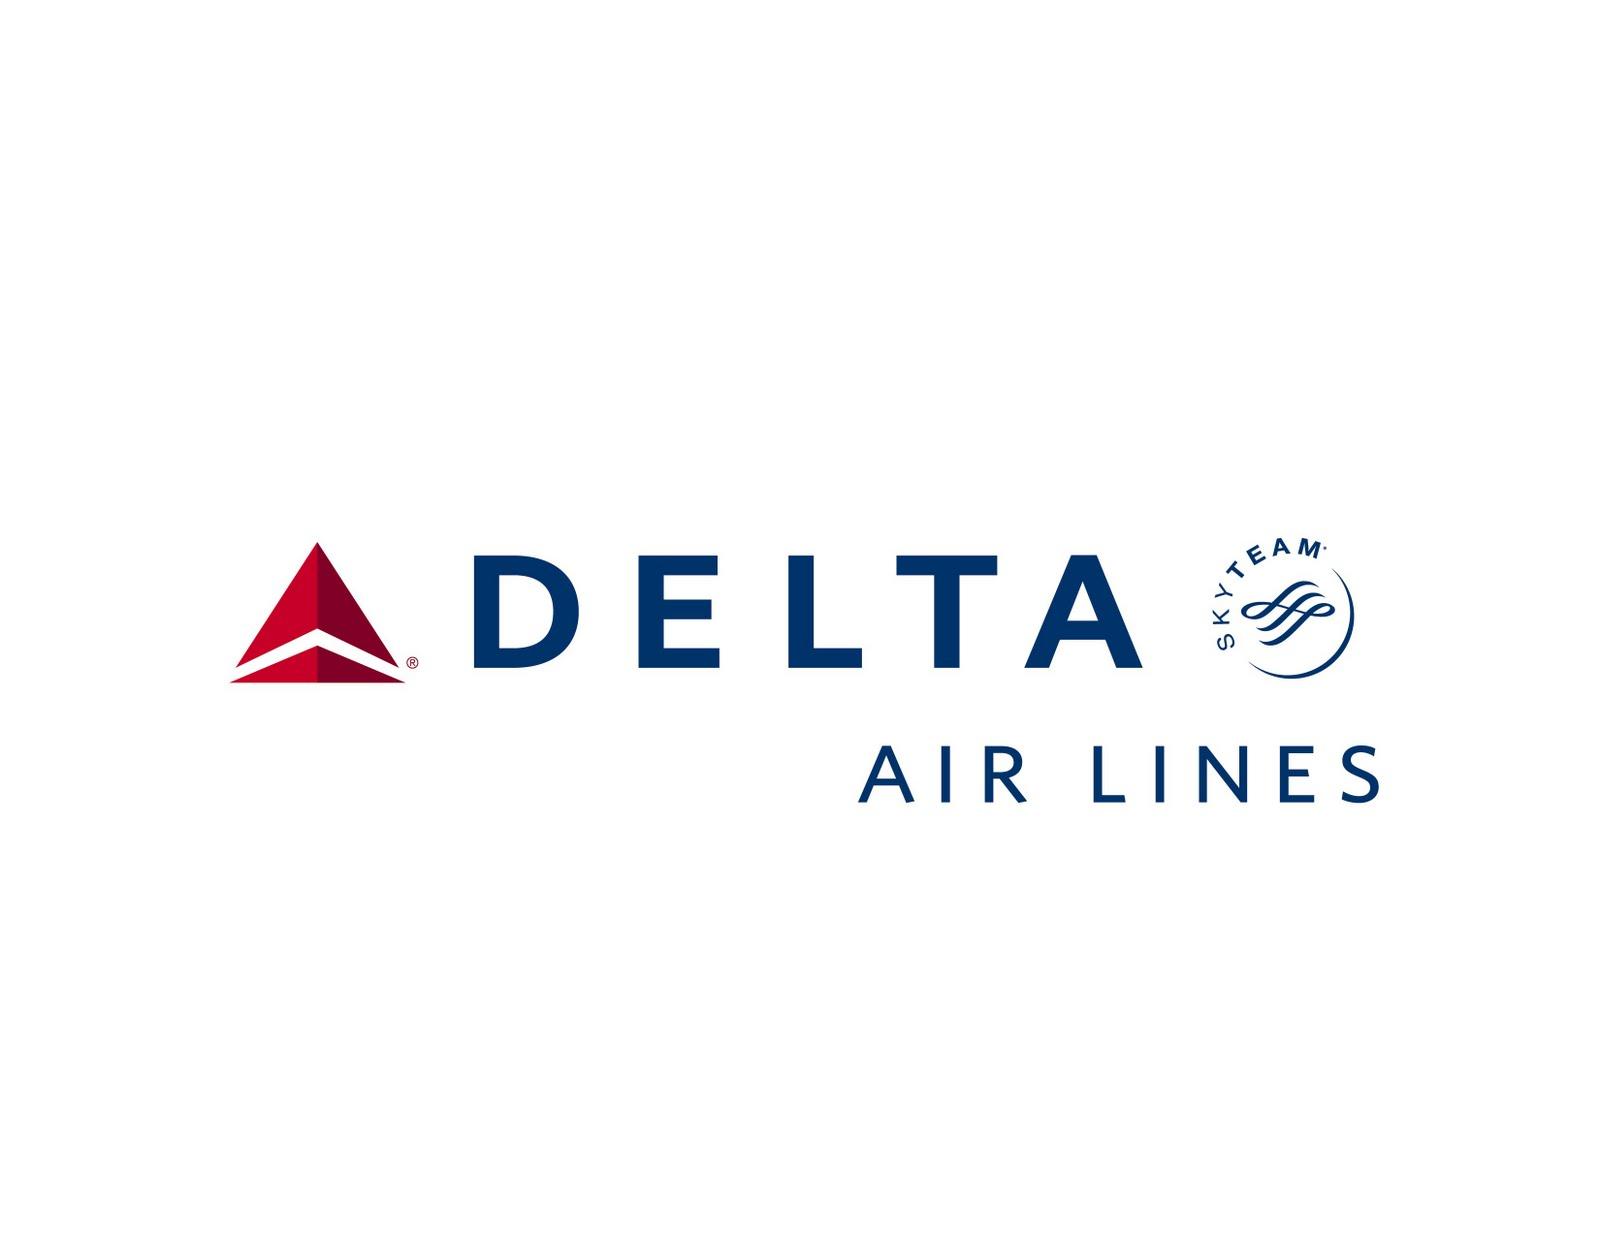 Skyteam Delta Airlines / Delta